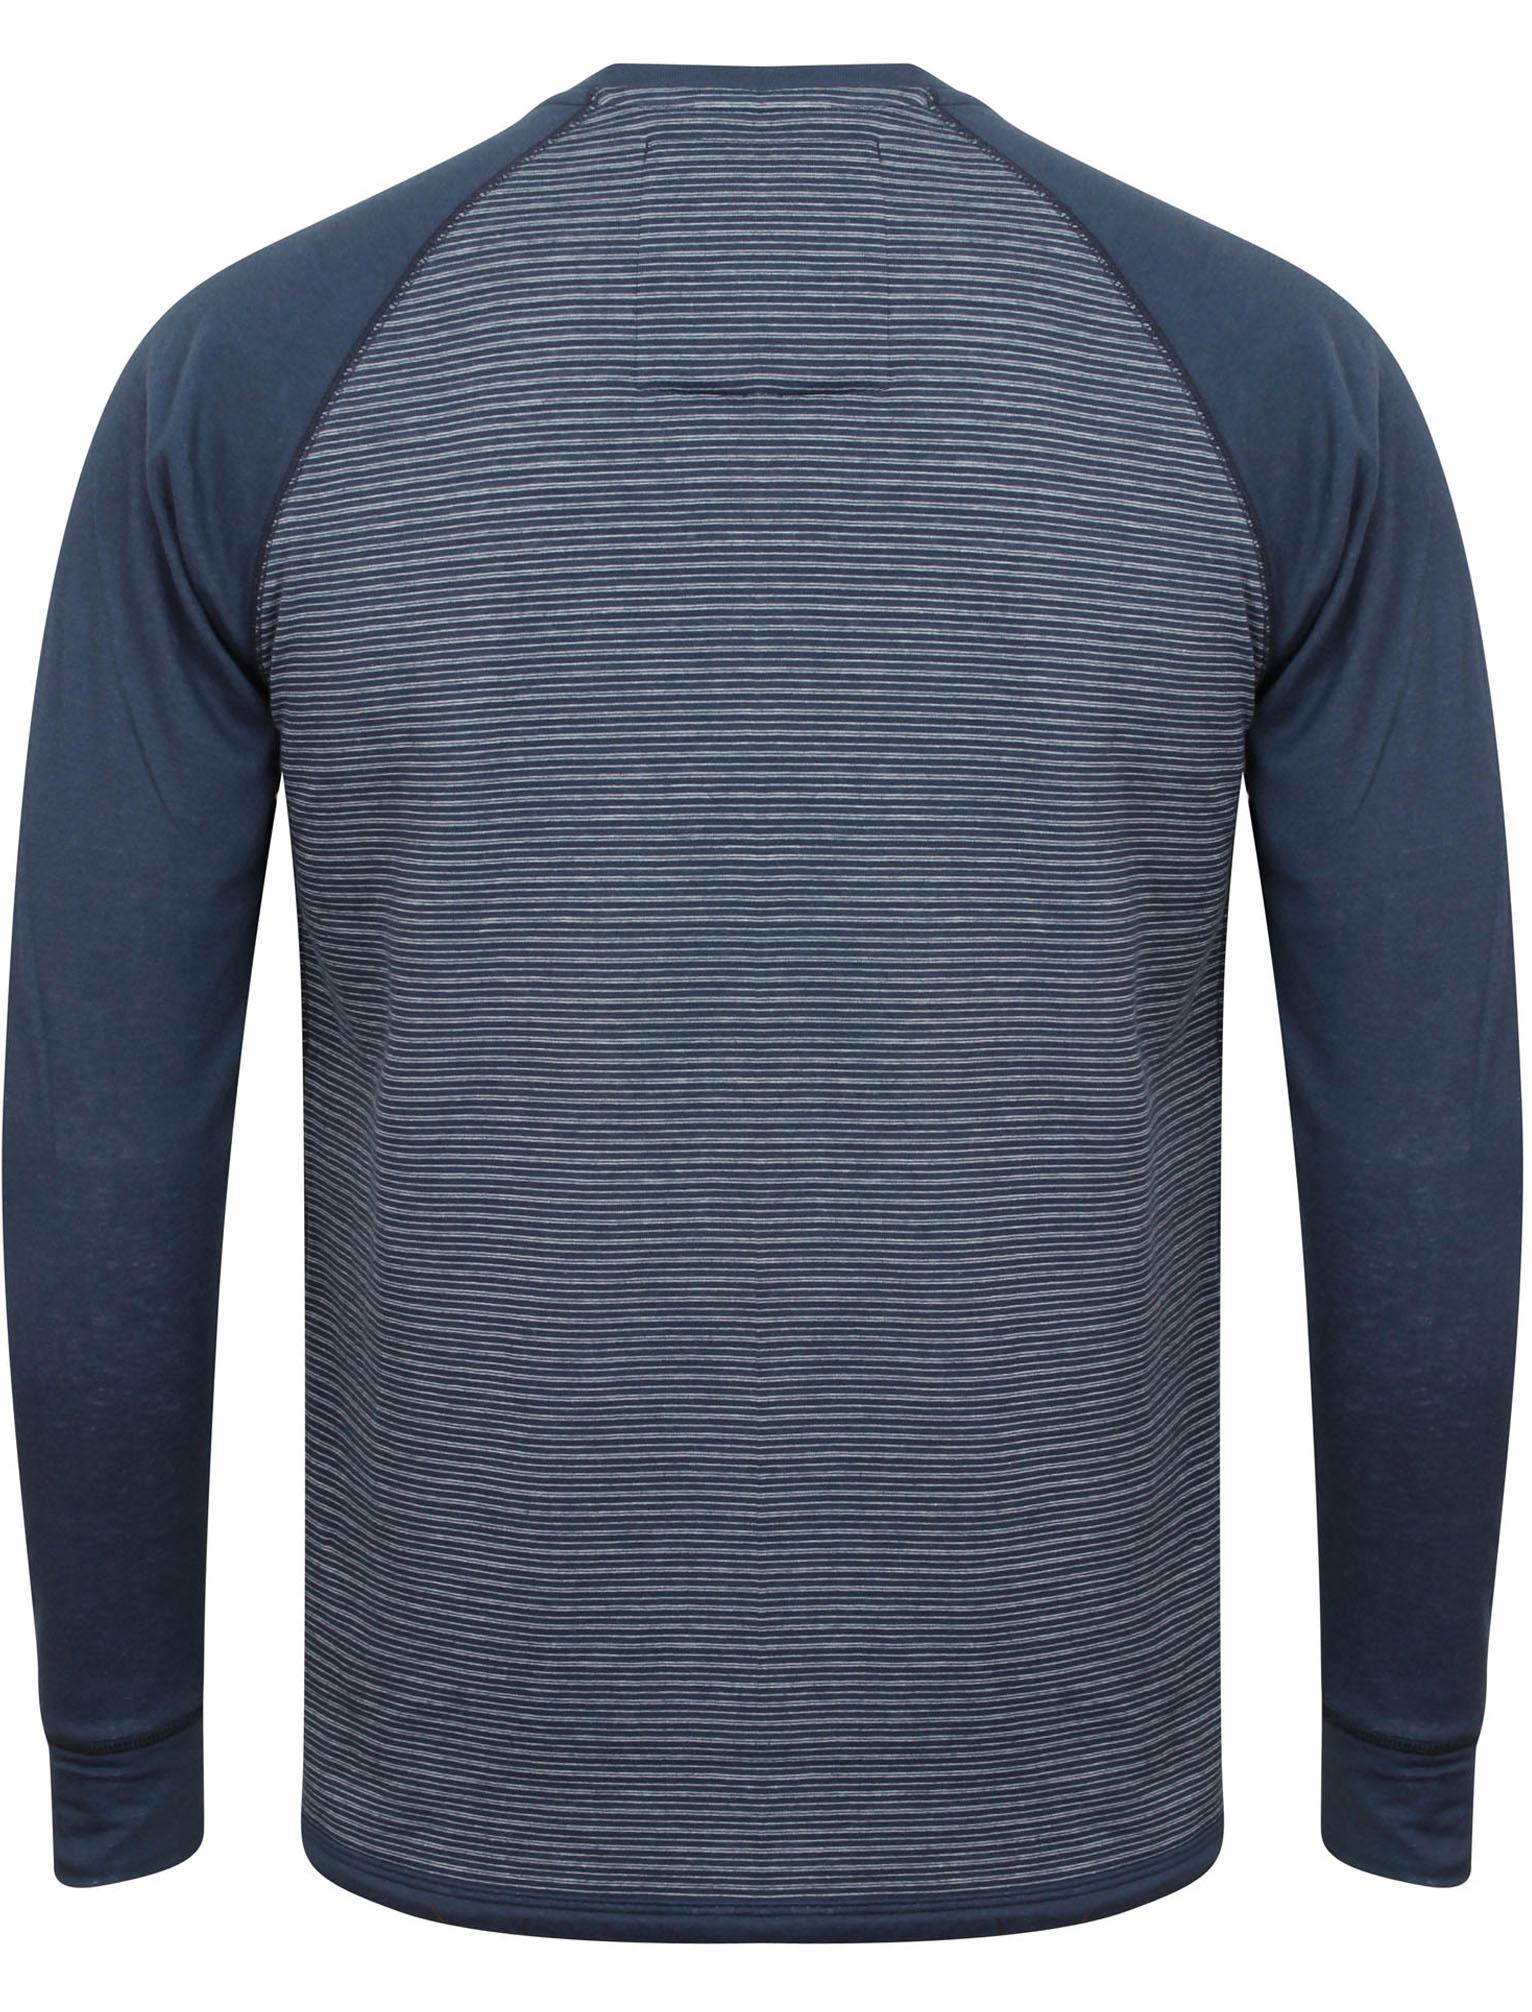 New-Mens-Tokyo-Laundry-Sephro-Raglan-Long-Sleeve-Henley-T-shirt-Top-Size-S-XL thumbnail 7